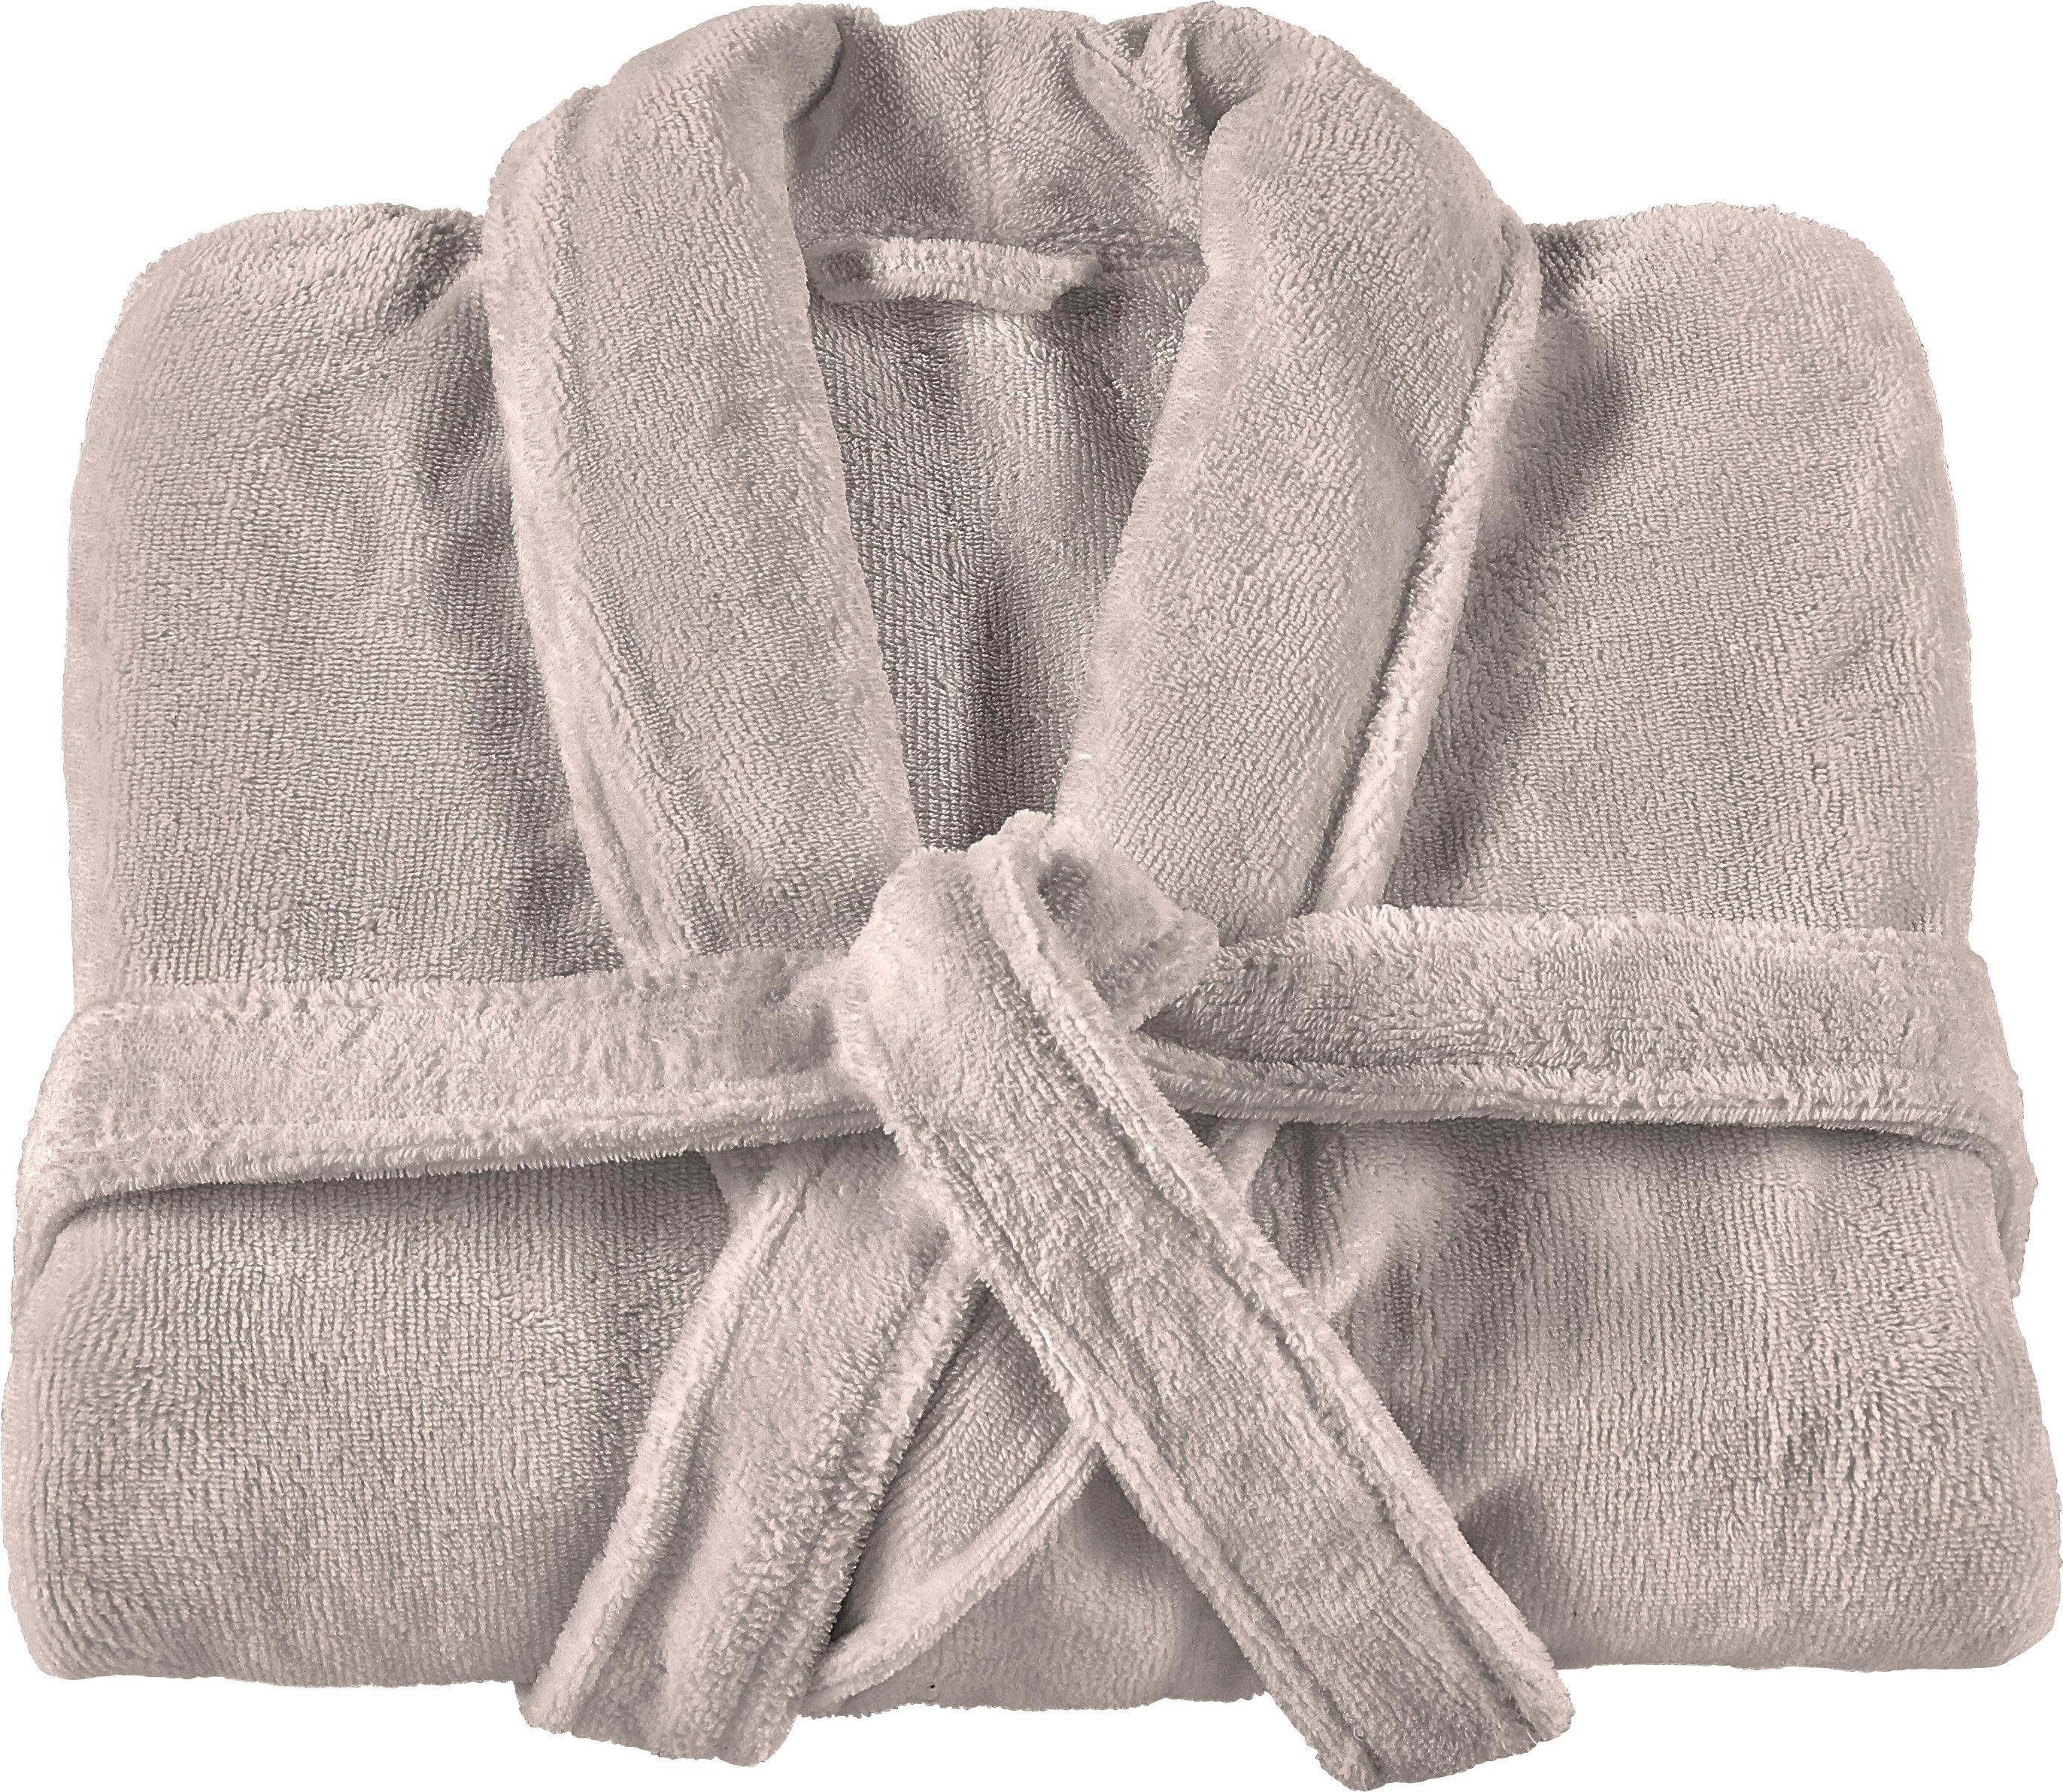 Bademantel Marcus in Hellbraun - Hellbraun, Textil (S,M,L,XL) - PREMIUM LIVING